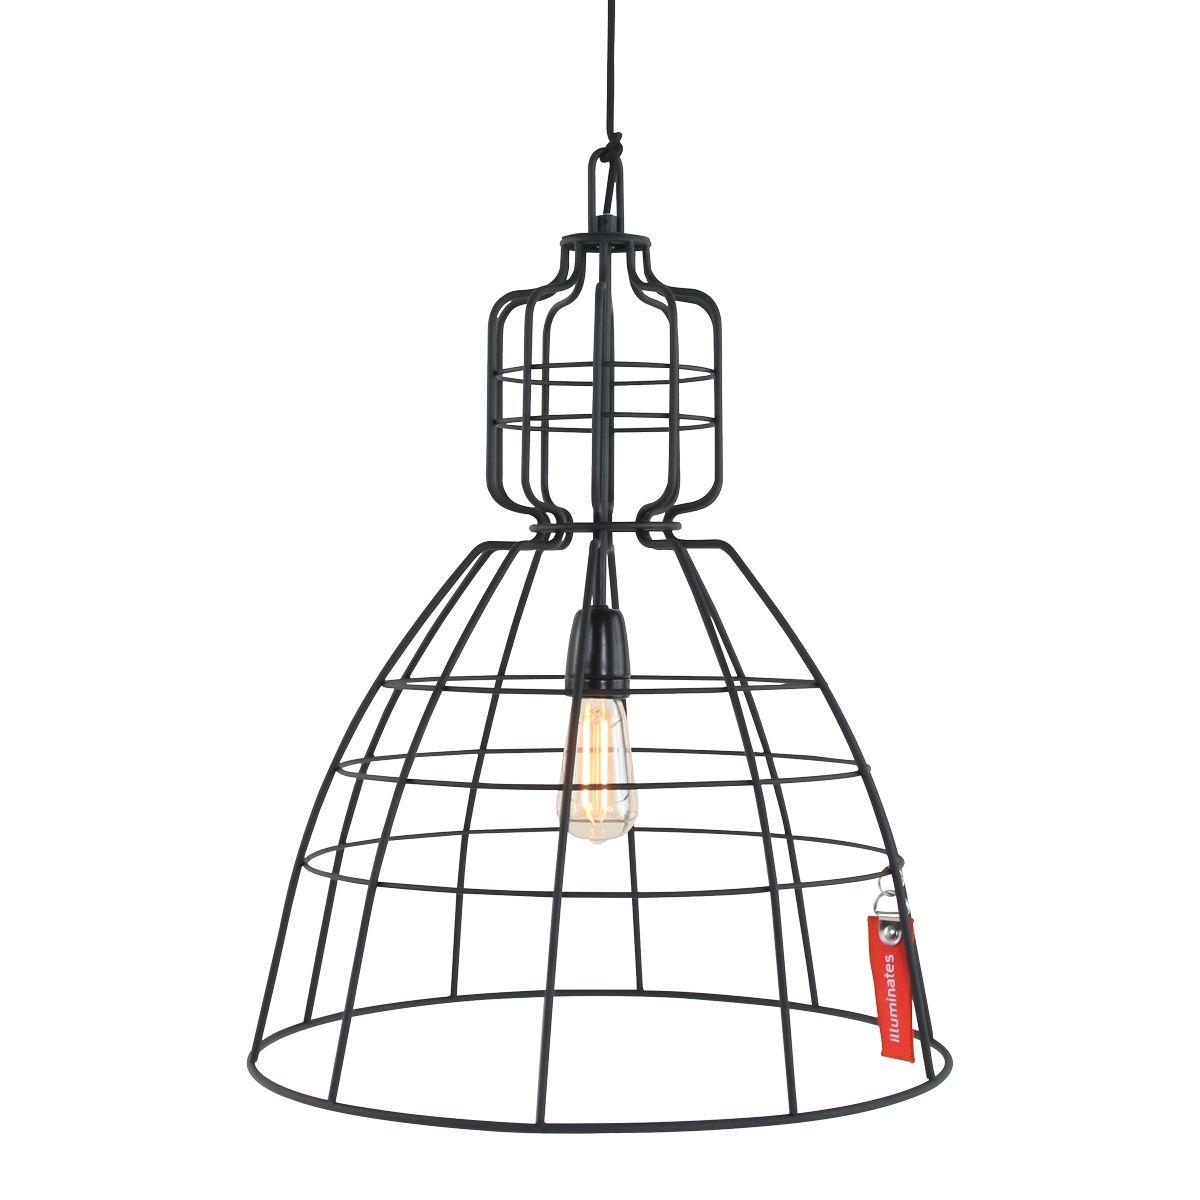 OUTLET - Mark III hanglamp Anne Lighting zwart